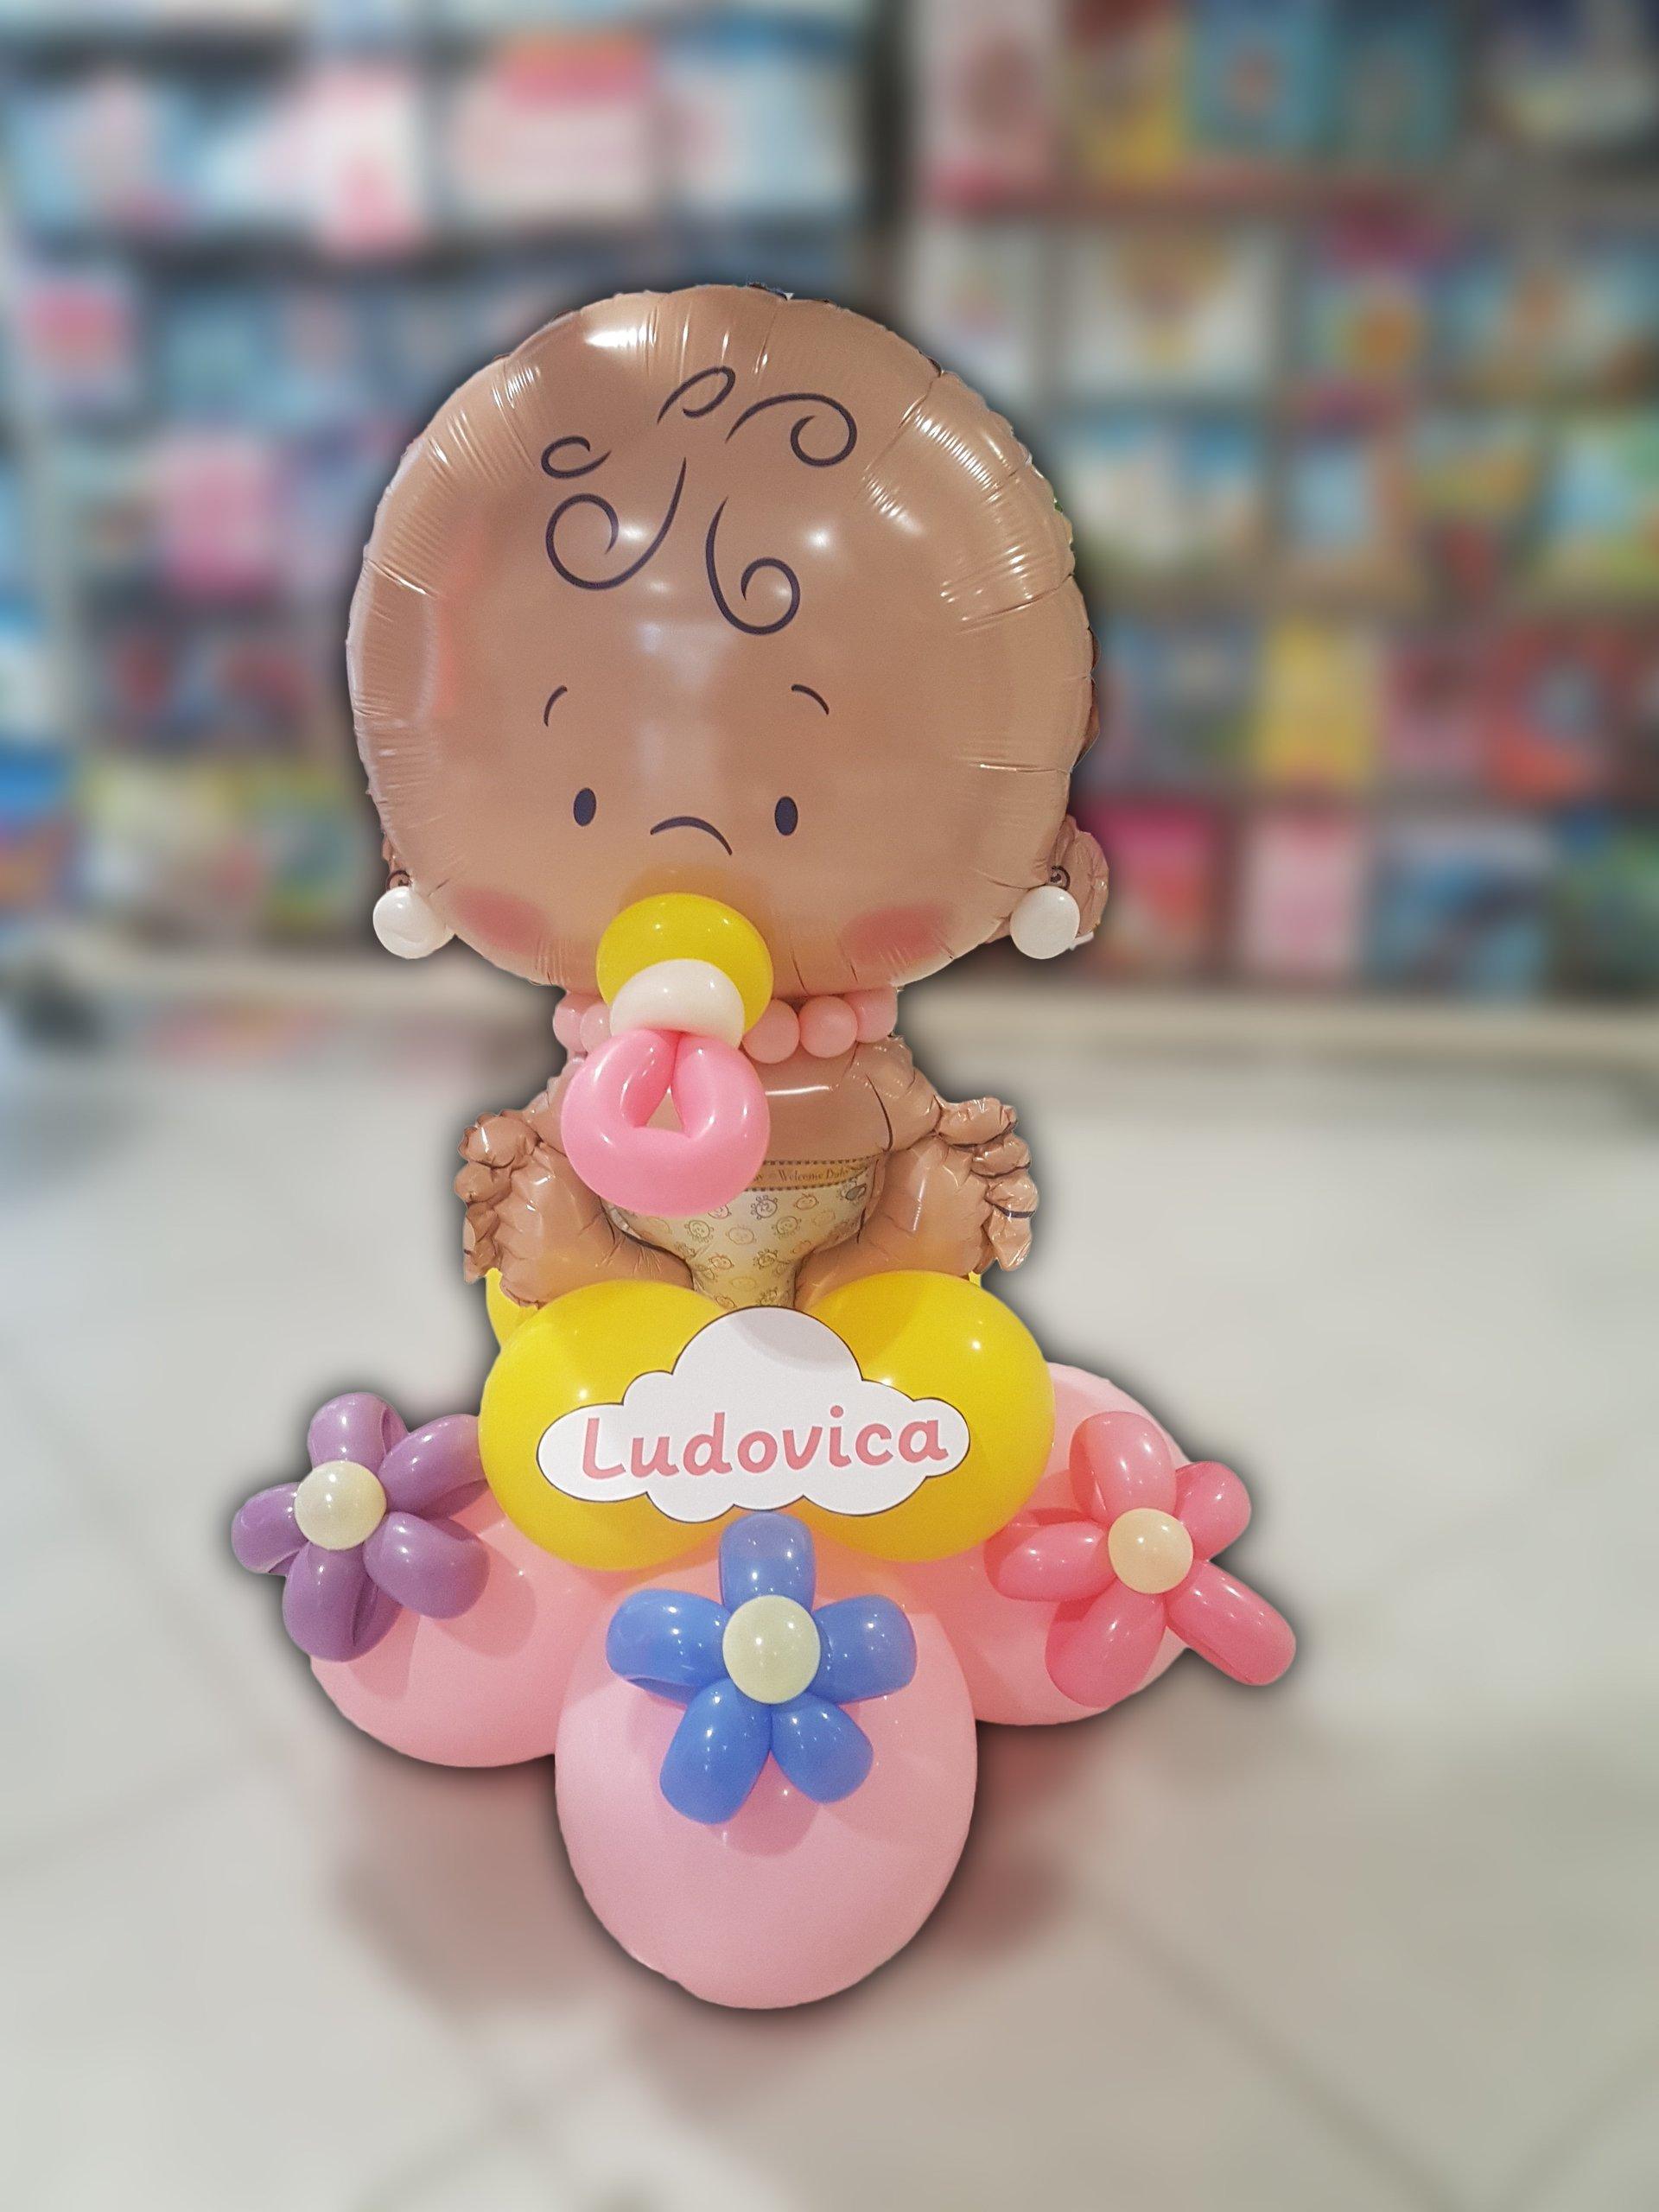 nascita-palloncini-bimba-accessori-fiori-margherite-trade-global-service